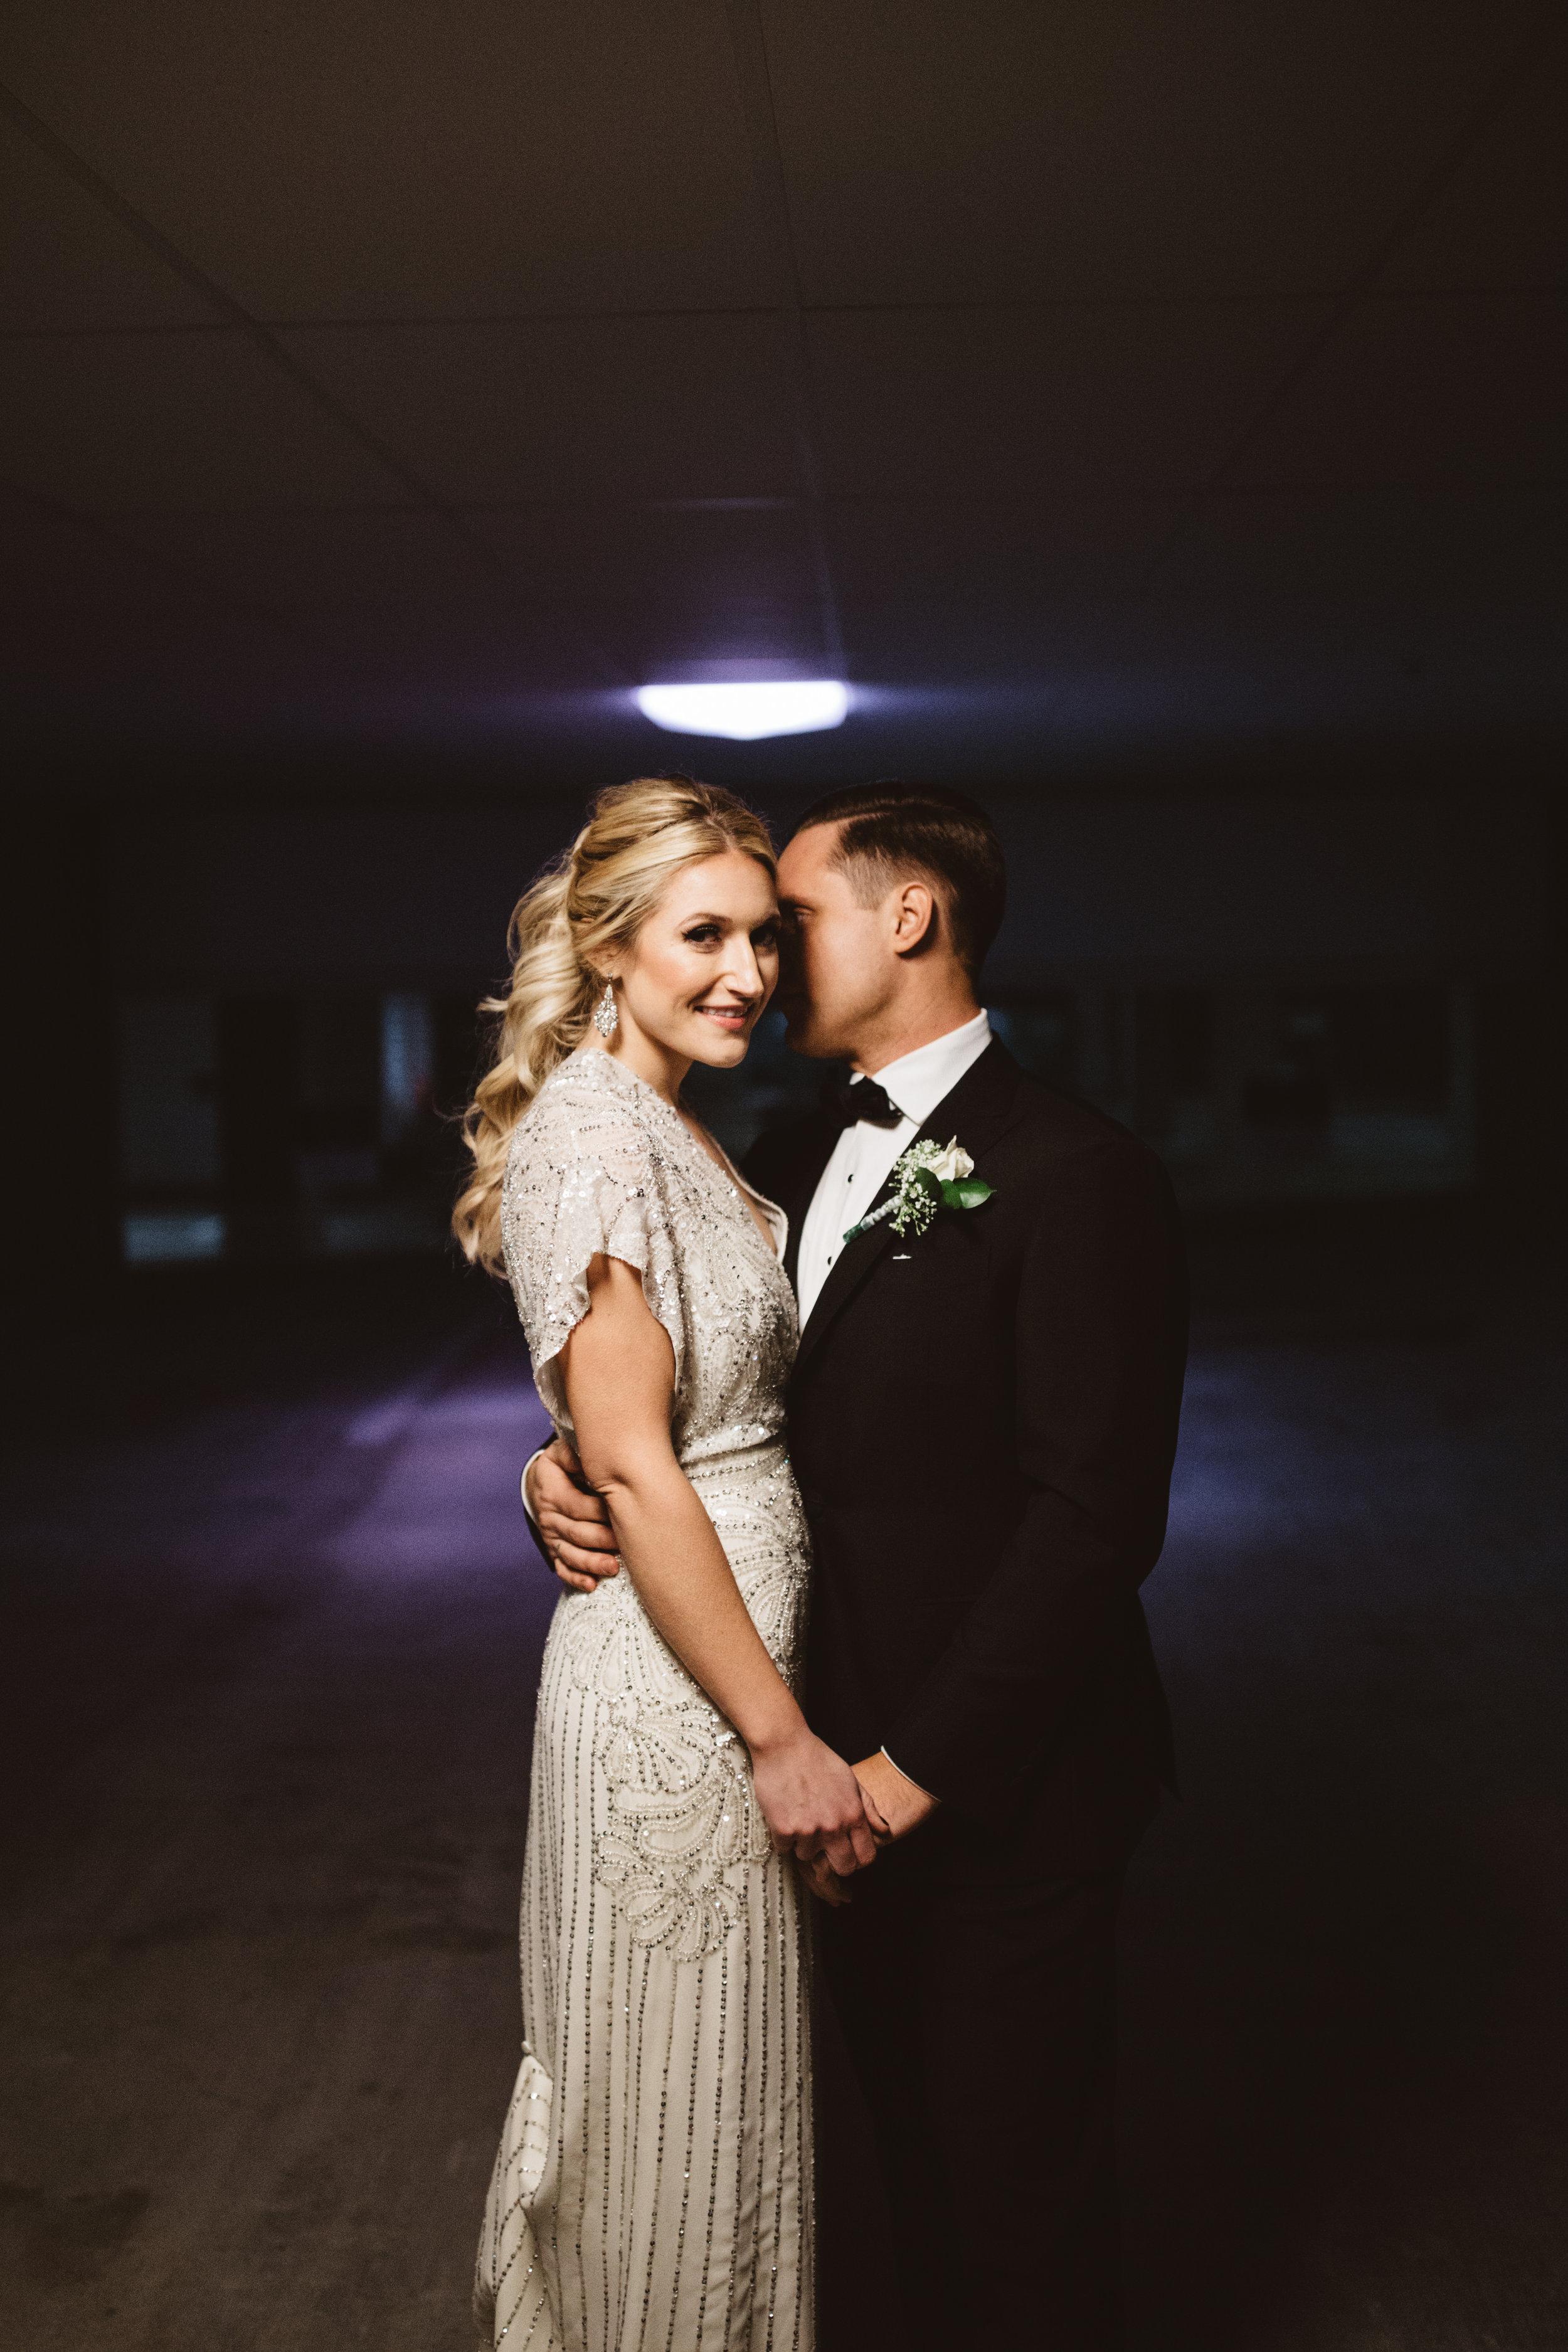 Mattie Bell Photography- Kelly & Zack Wedding Atlanta Brewery -242.jpg